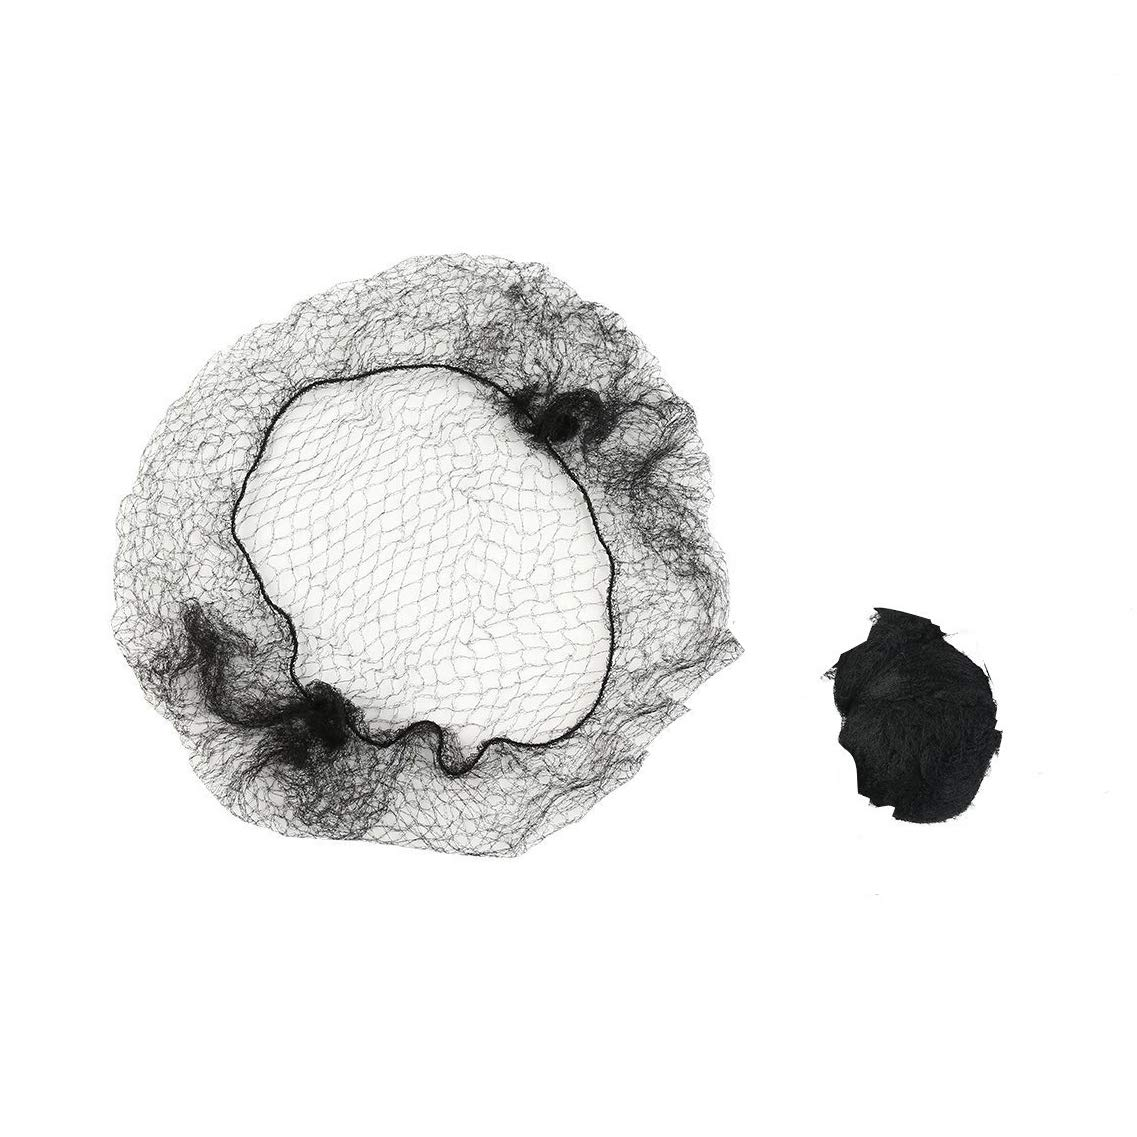 60Pcs Hair Nets Invisible Elastic Edge Mesh Reusable Bun Hair Nets for Ballet Dance or Food Service (20 Inches/50cm, Black)